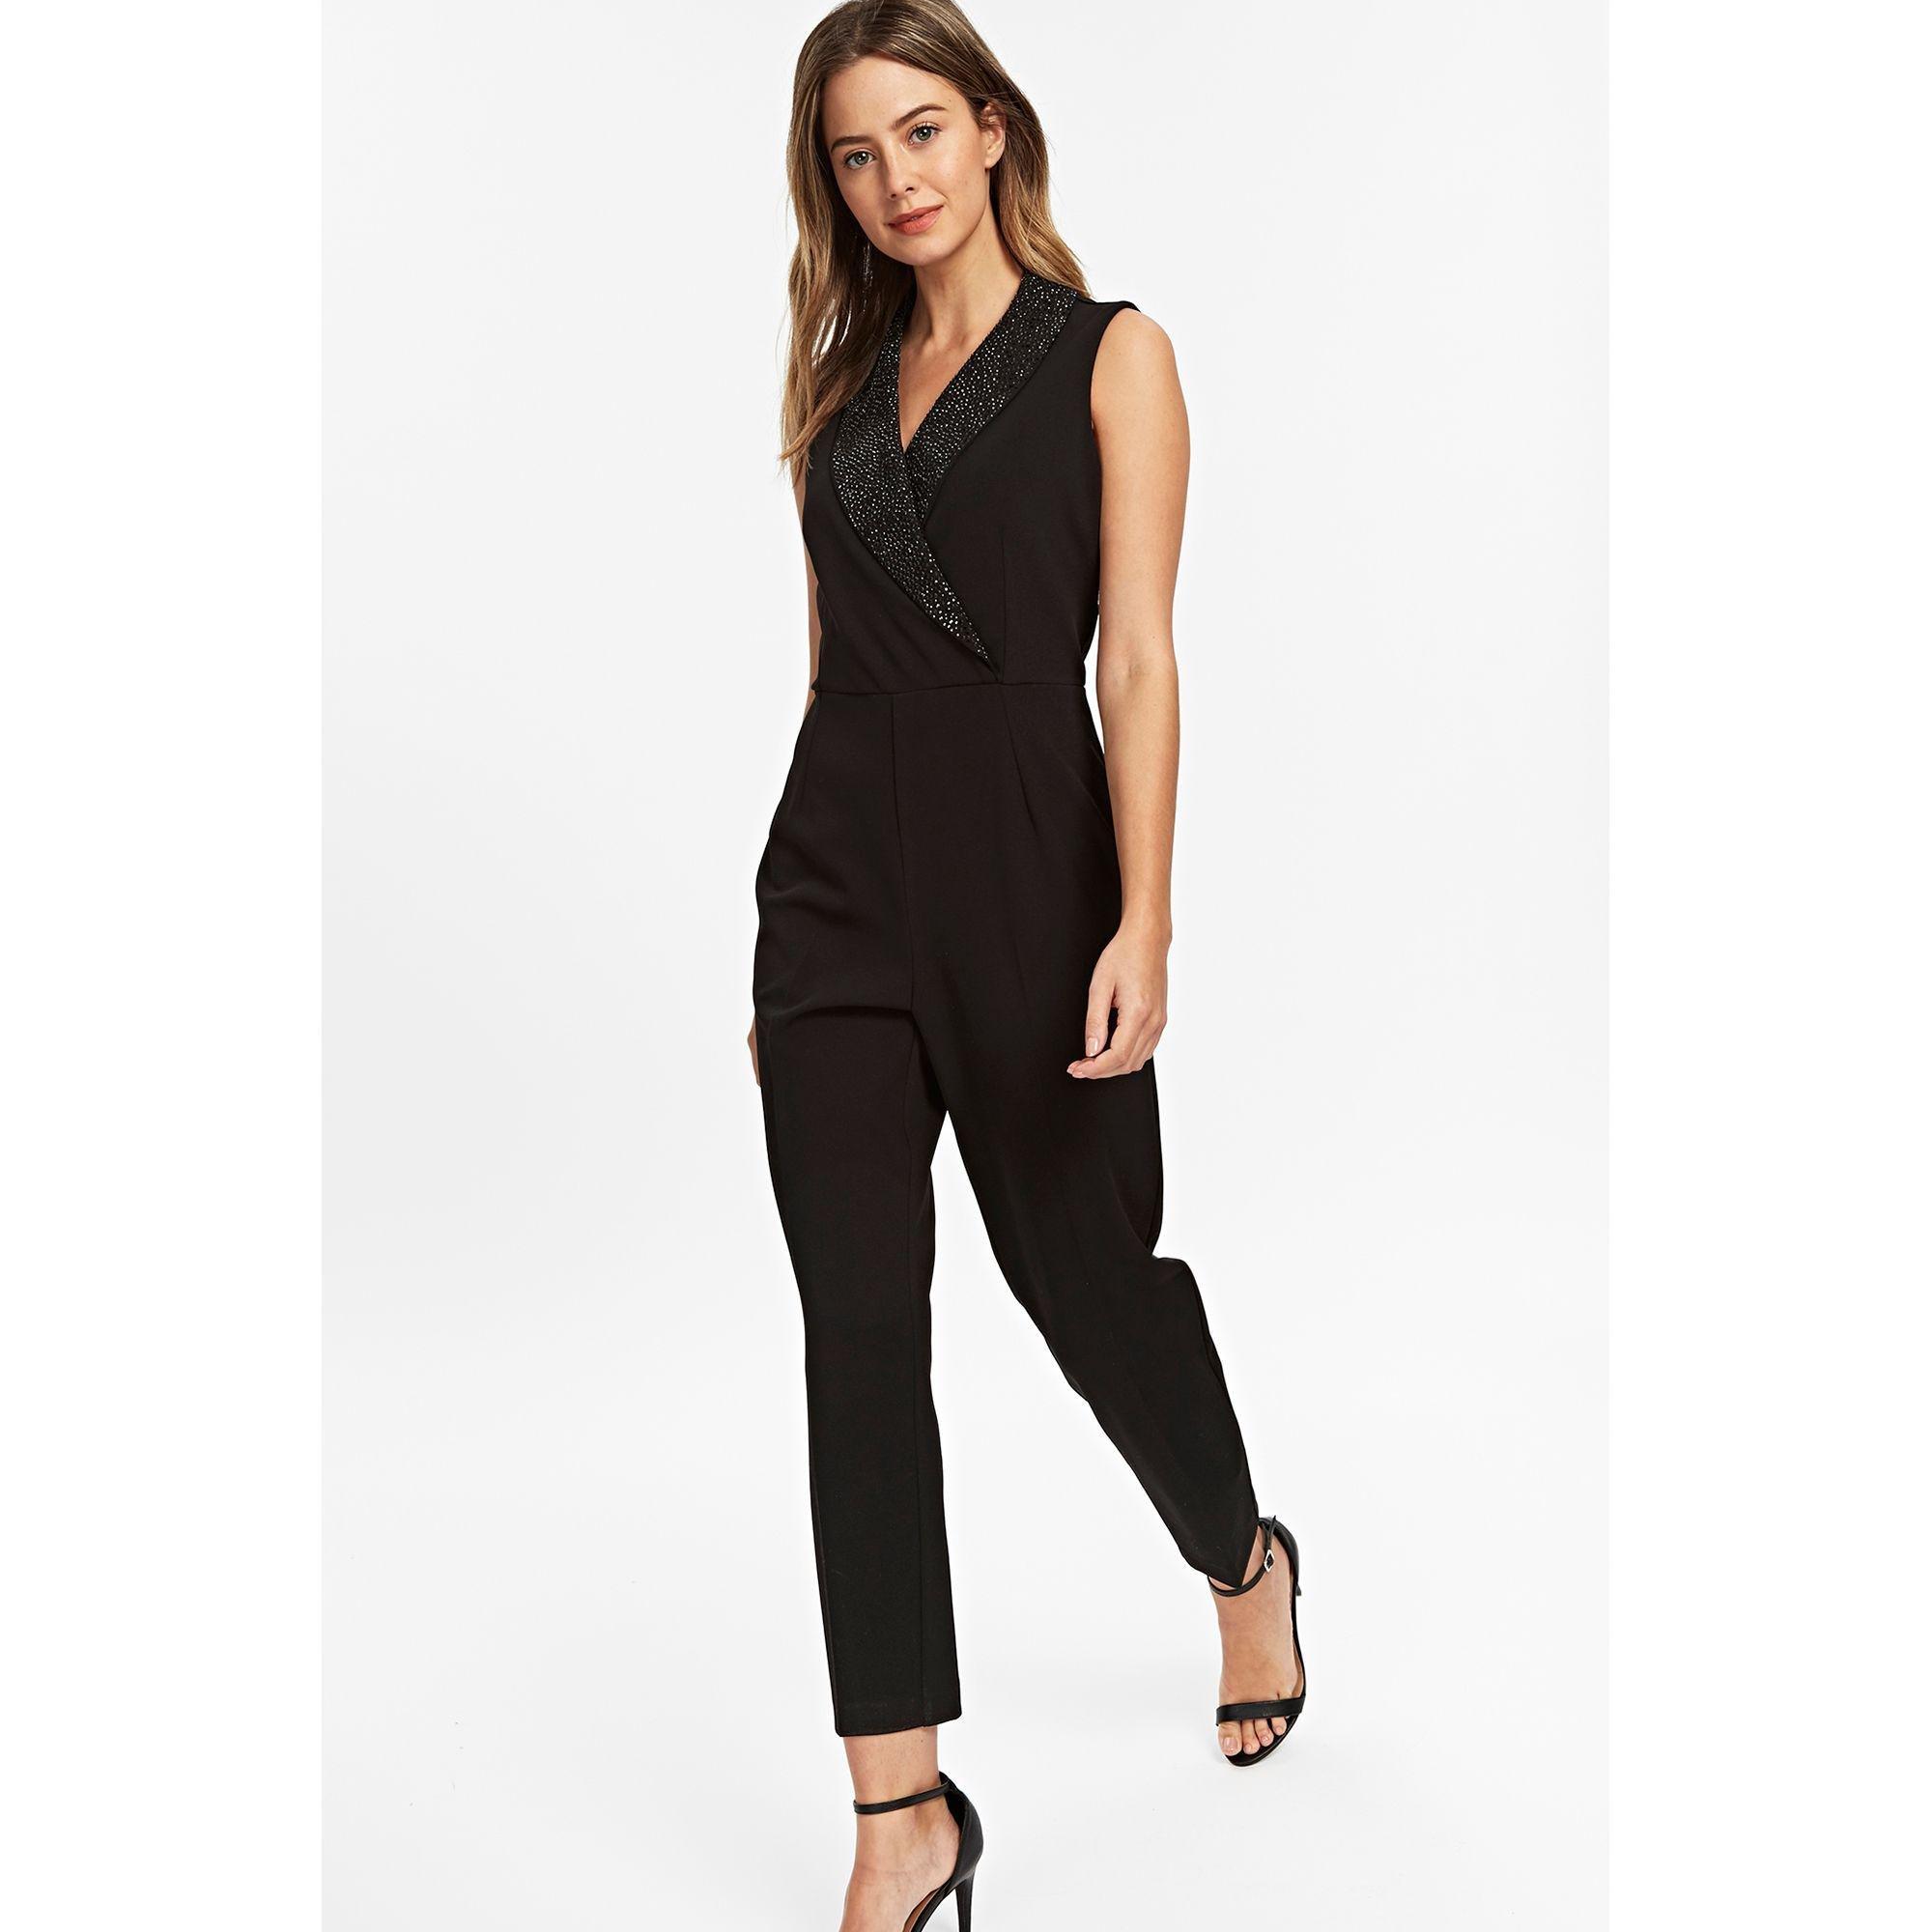 58d58b884485 Wallis Petite Black Diamante Tuxedo Jumpsuit in Black - Save 50% - Lyst